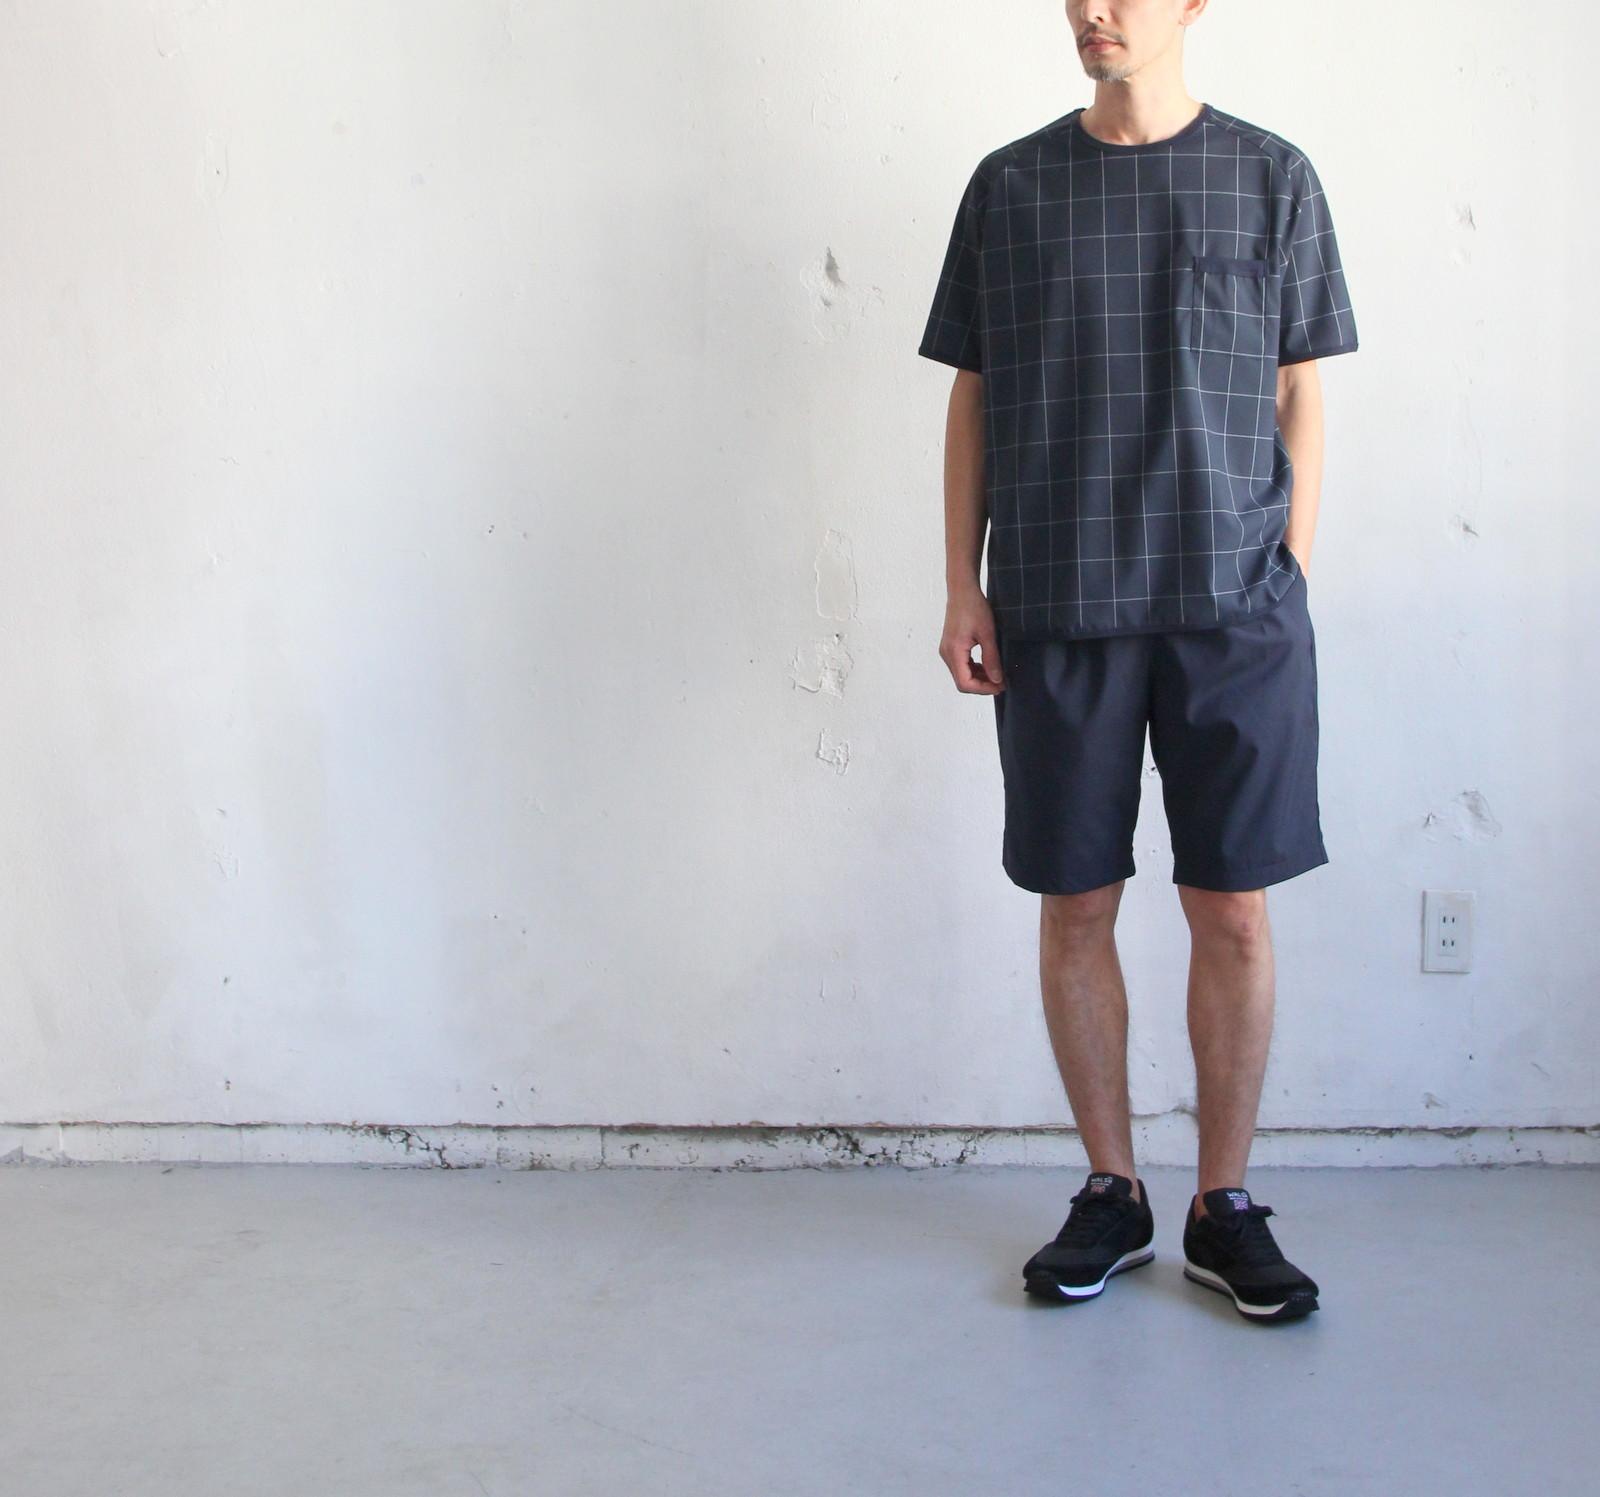 Tro Cool T-shirt_c0379477_20184041.jpg